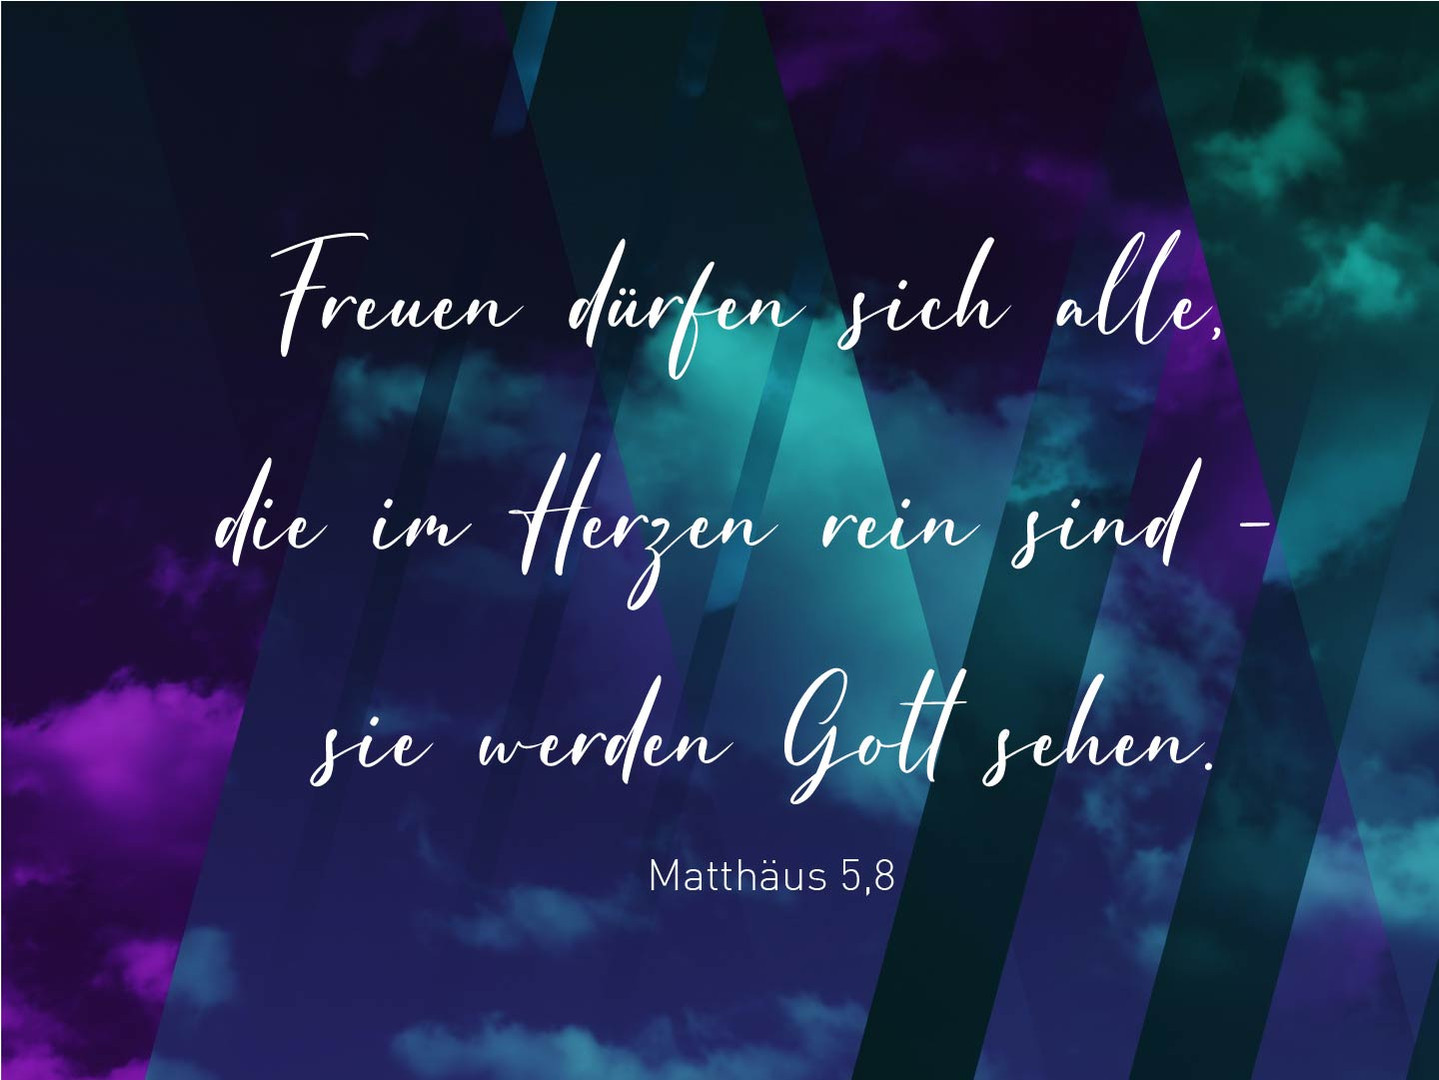 Matthäus 5,8.jpg